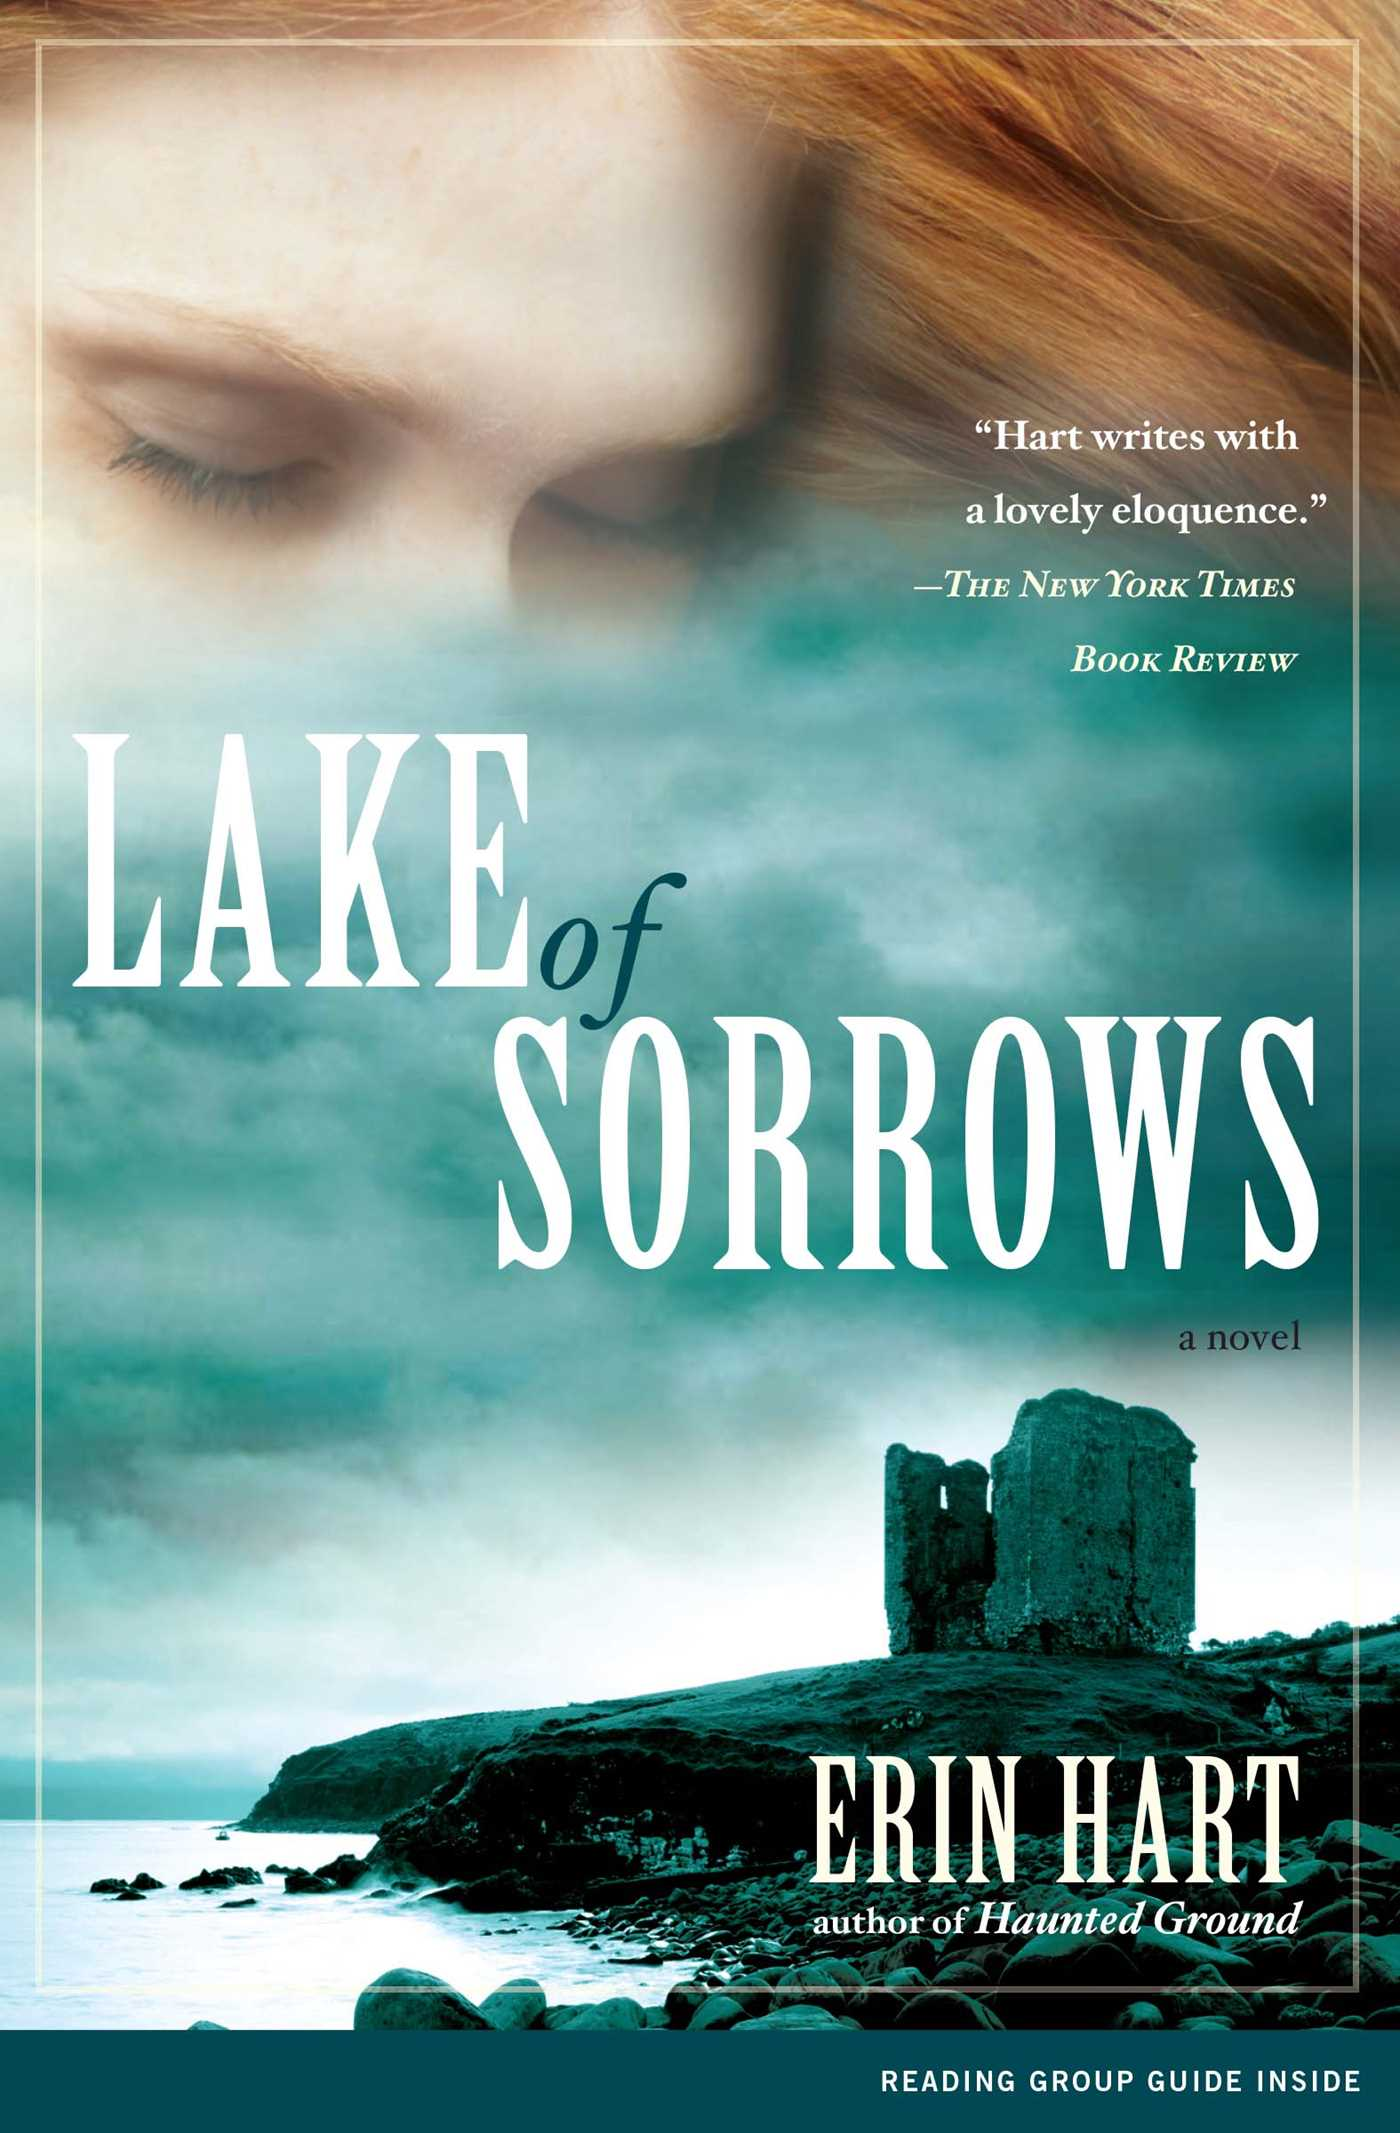 Lake of sorrows 9781416541301 hr